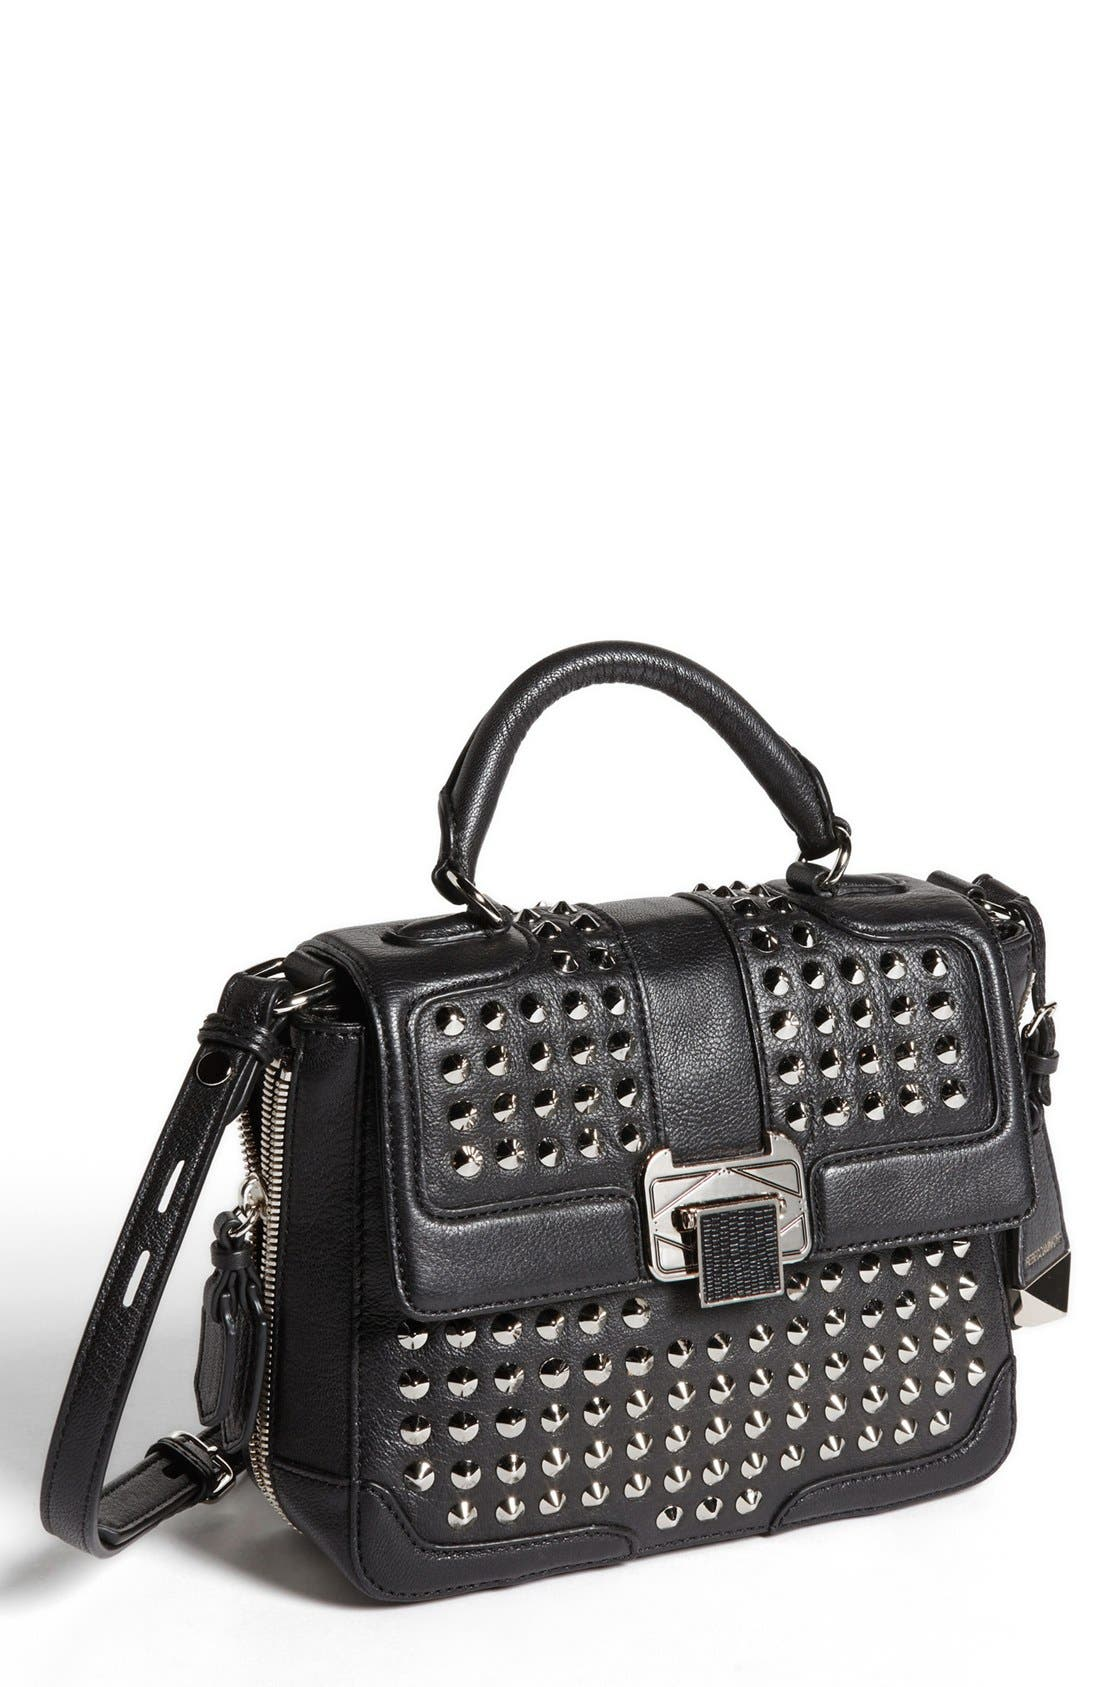 Main Image - Rebecca Minkoff 'Elle Mini with Studs' Crossbody Bag